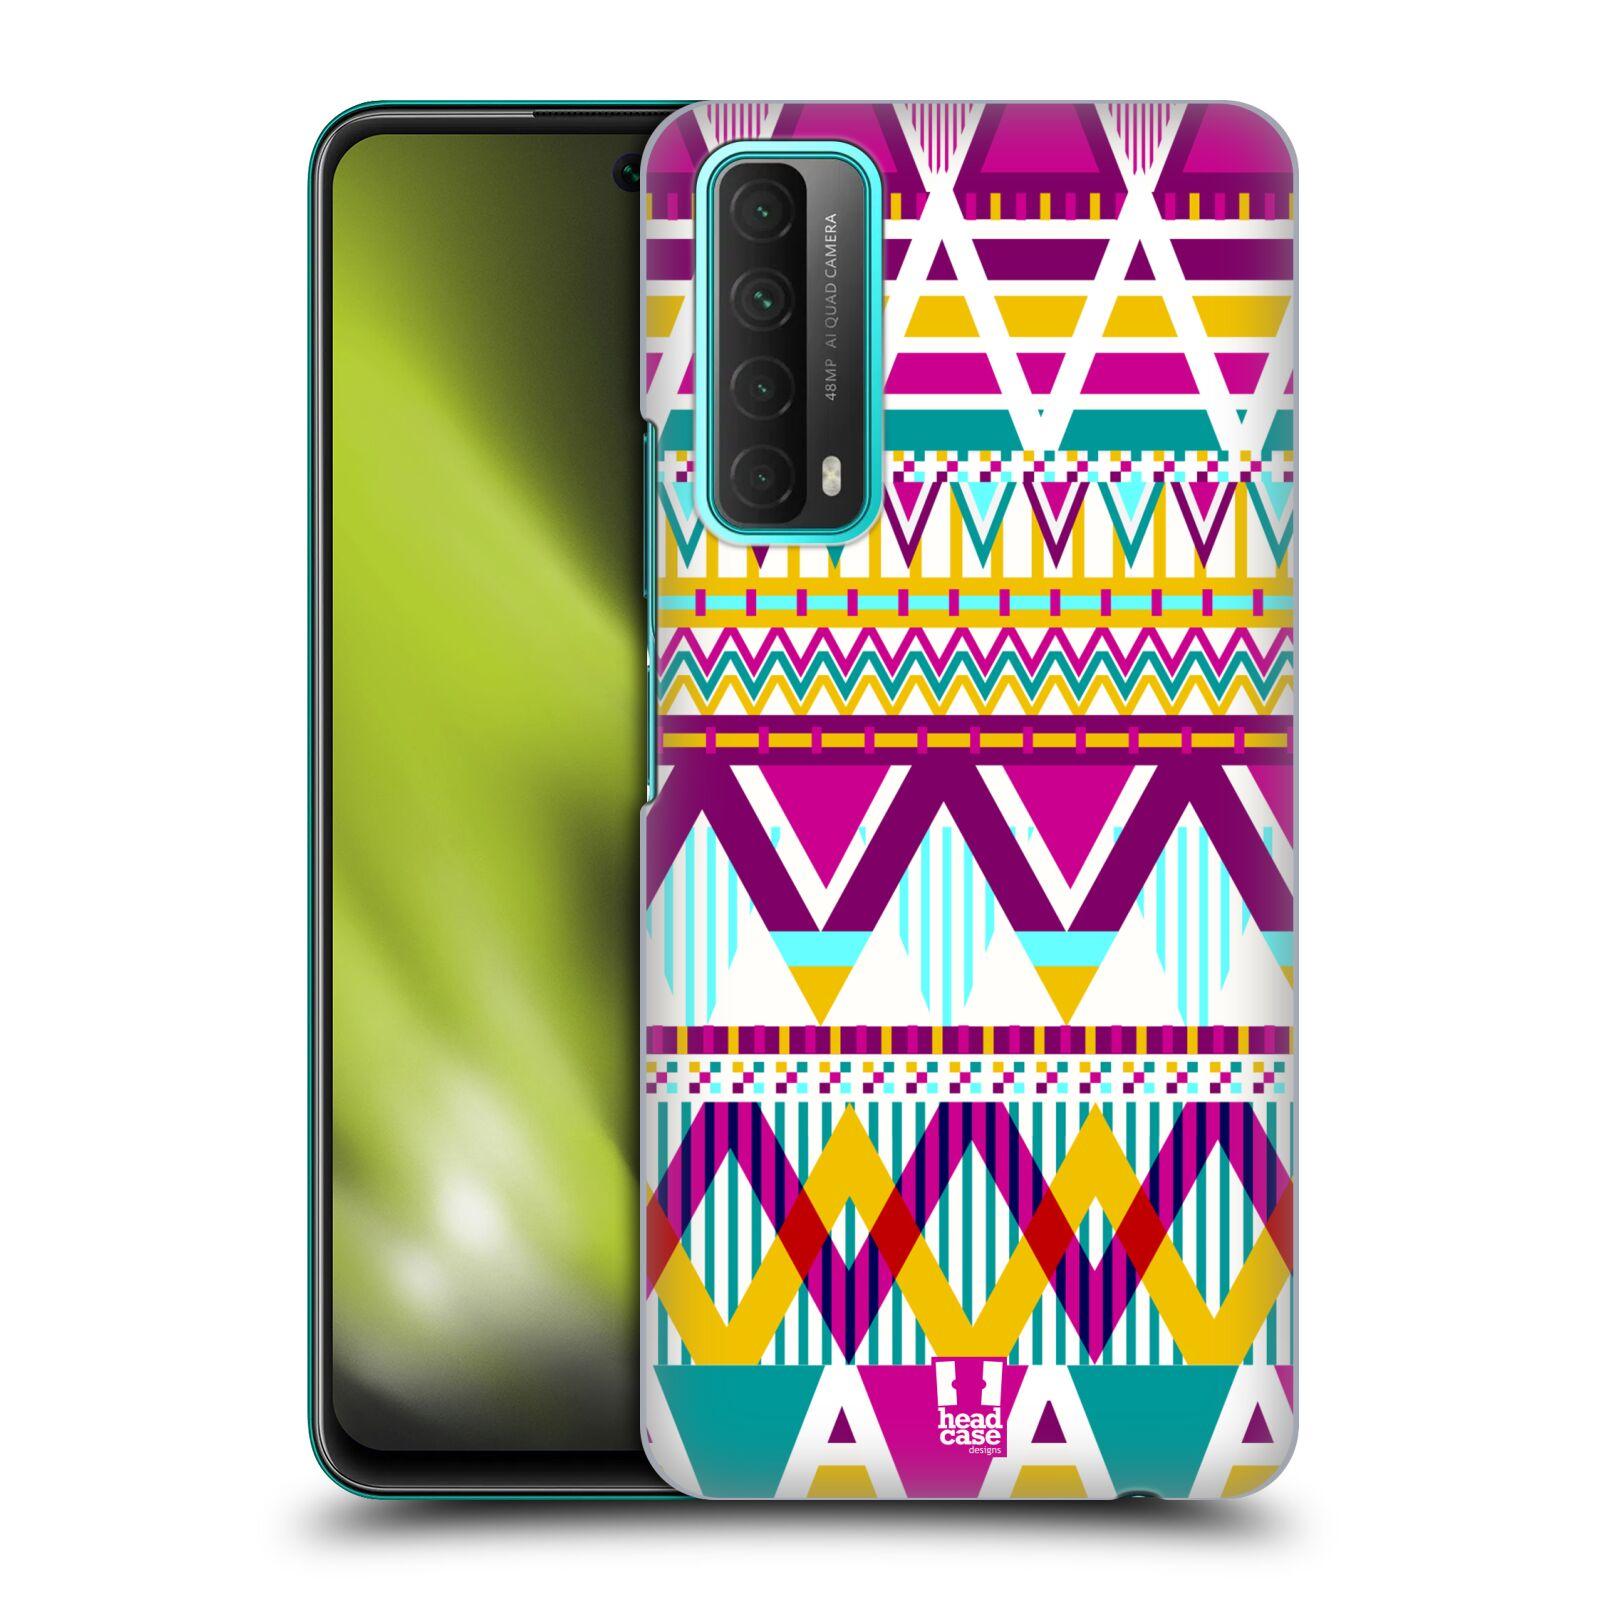 Plastové pouzdro na mobil Huawei P Smart (2021) - Head Case - AZTEC SUGARED